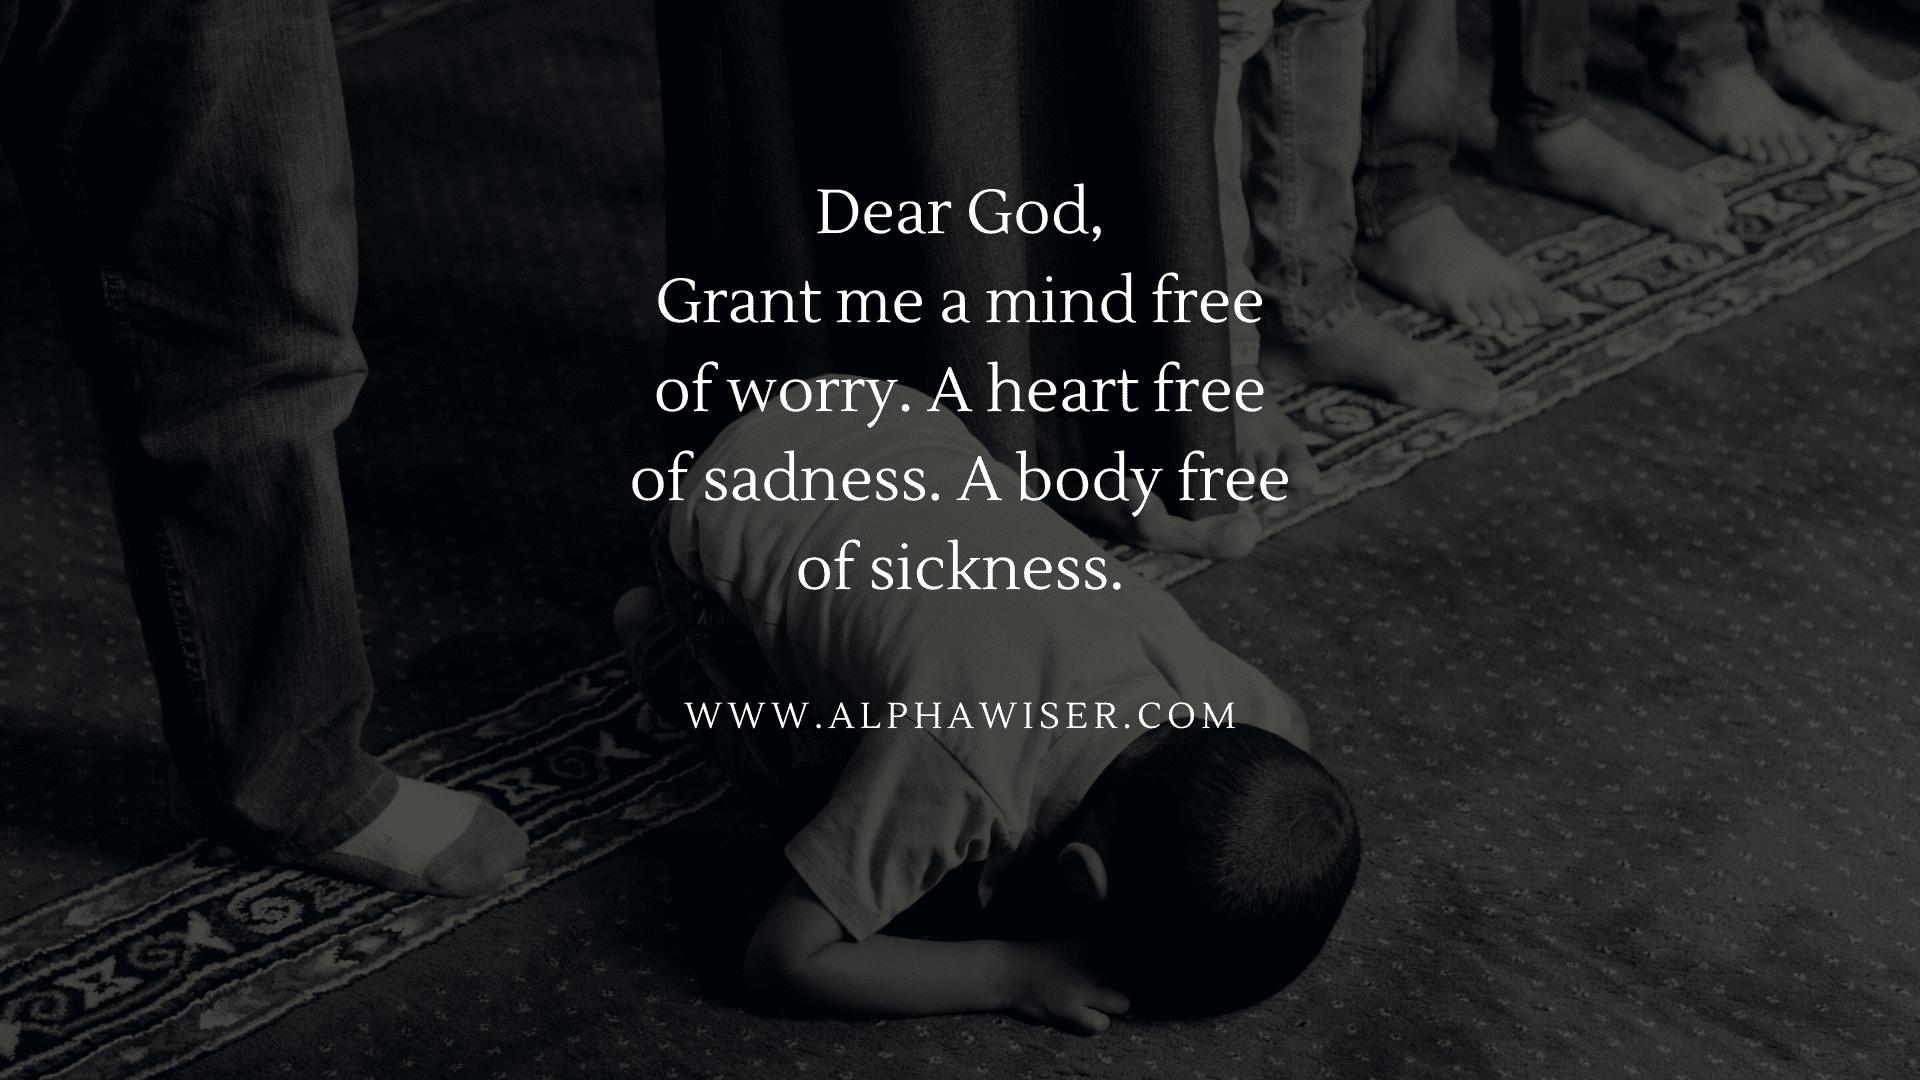 God please grant me a good heart